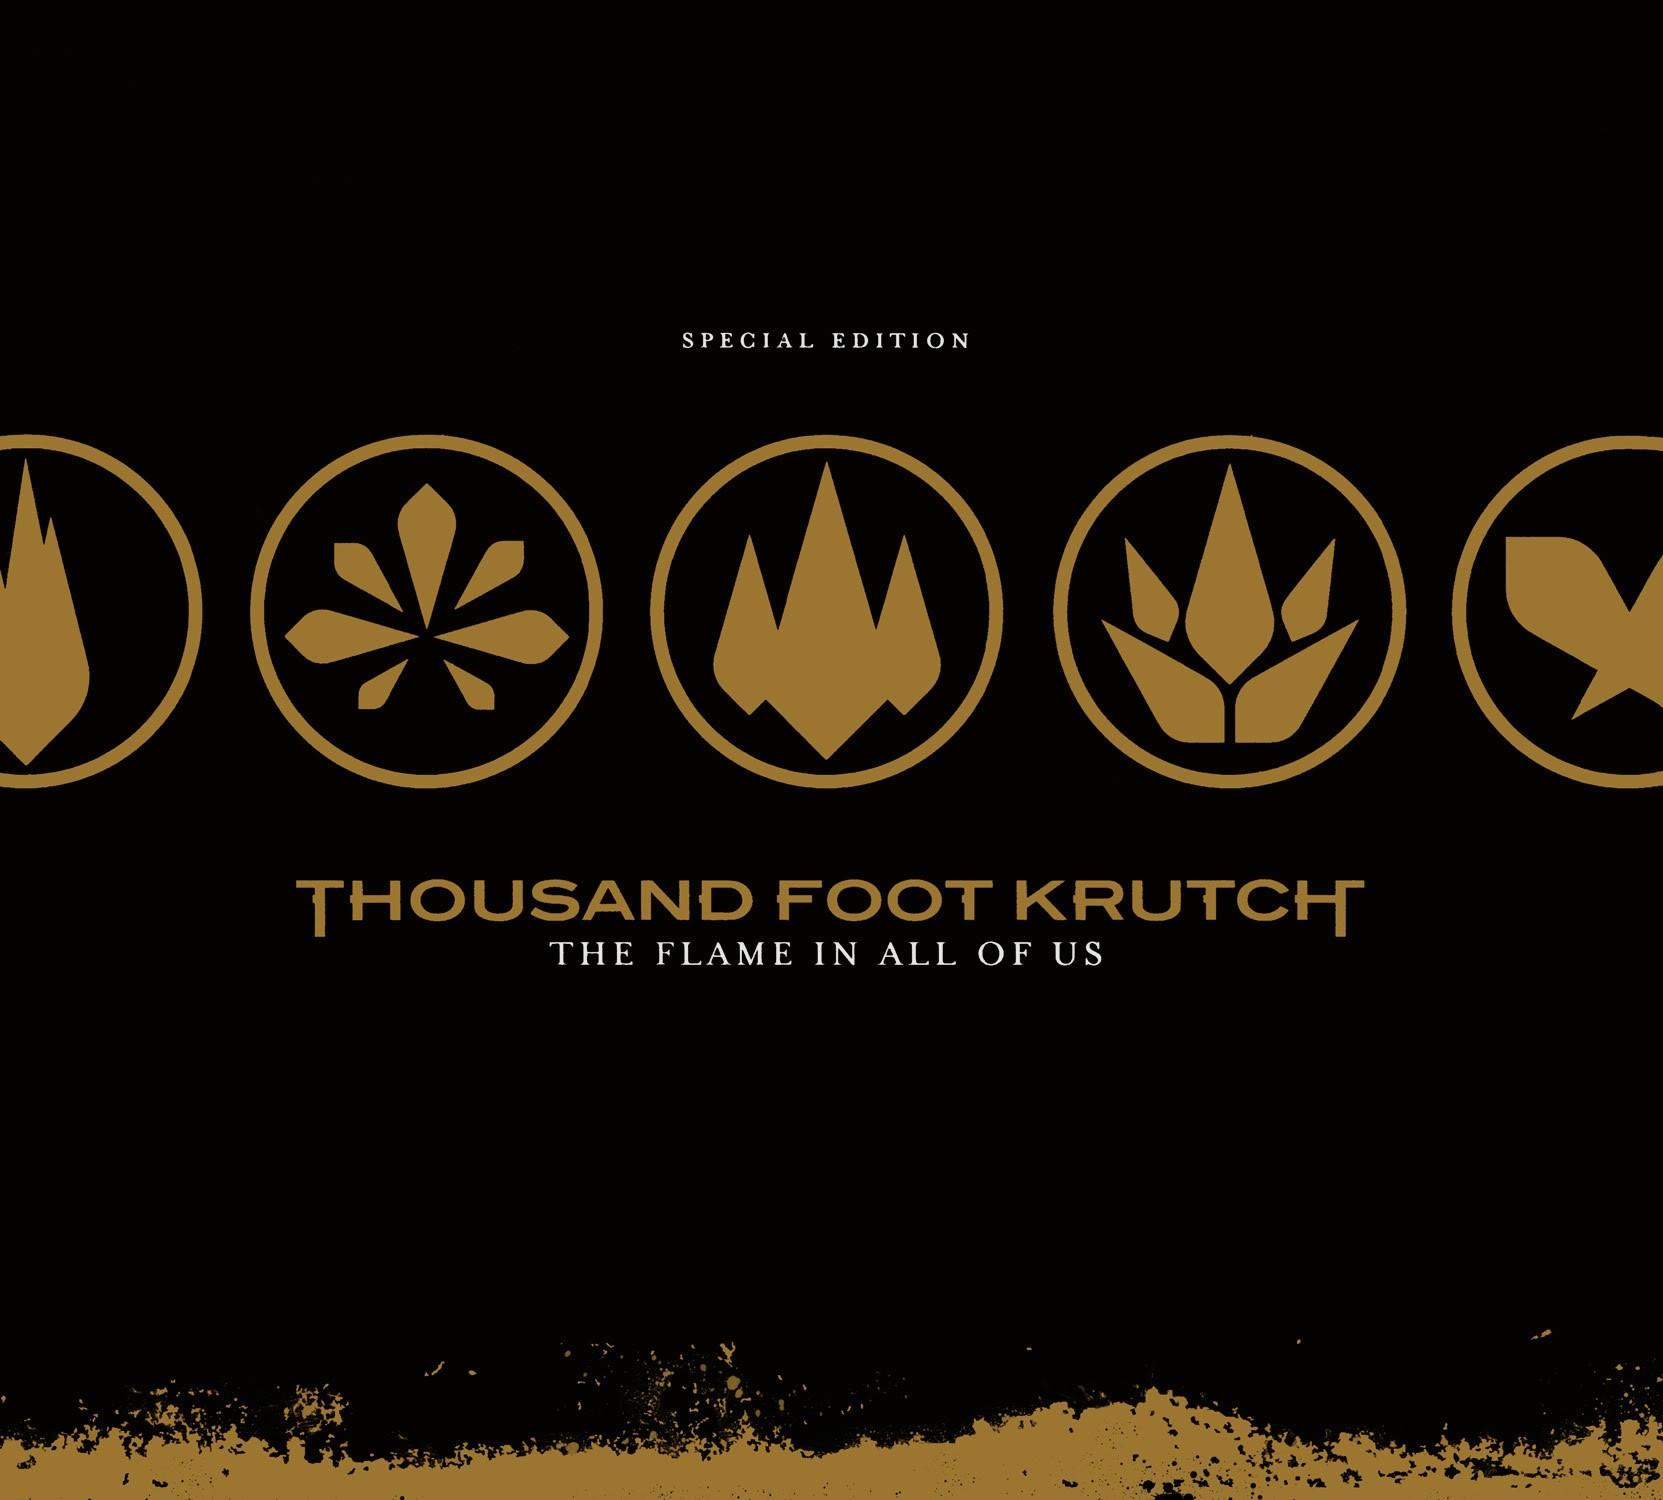 Thousand Foot Krutch Wallpapers HD Download 1663x1500